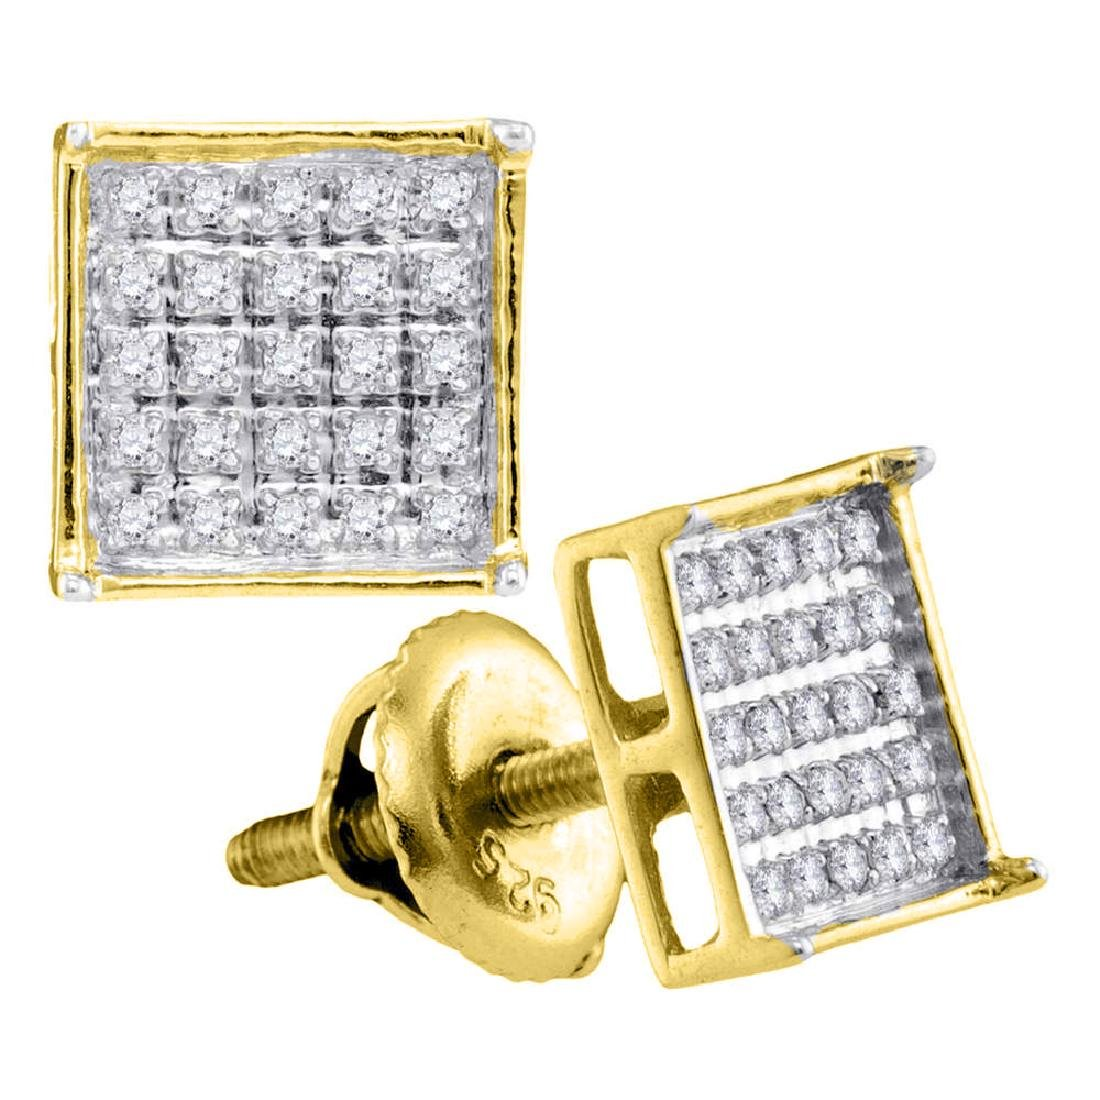 0.15 CTW Diamond Square Cluster Stud Earrings 14KT